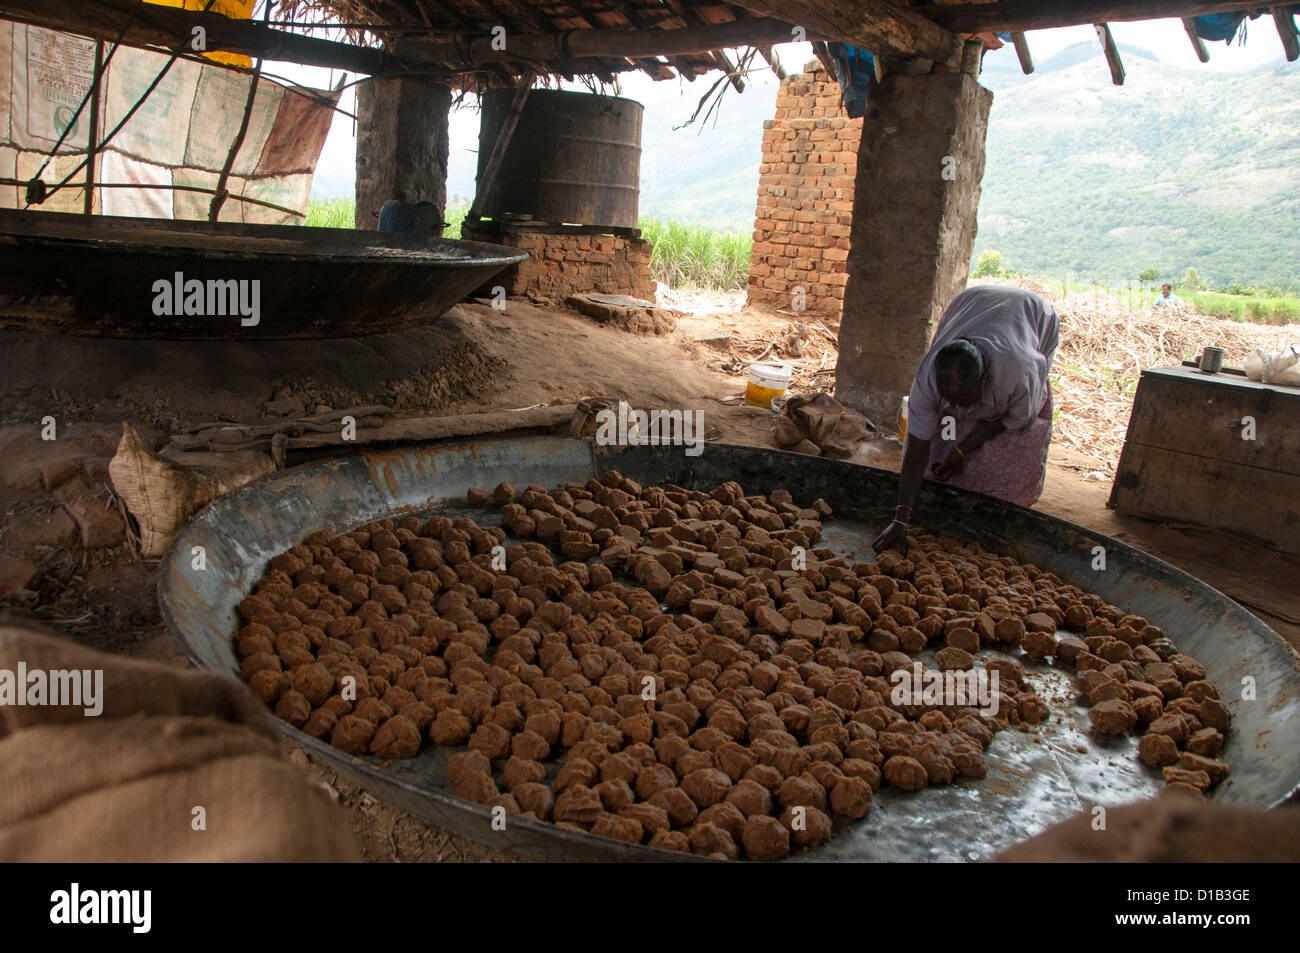 Indischer Jaggery-Produktion, so dass Jagrezucker Kugeln aus Zuckerrohrsaft Stockbild